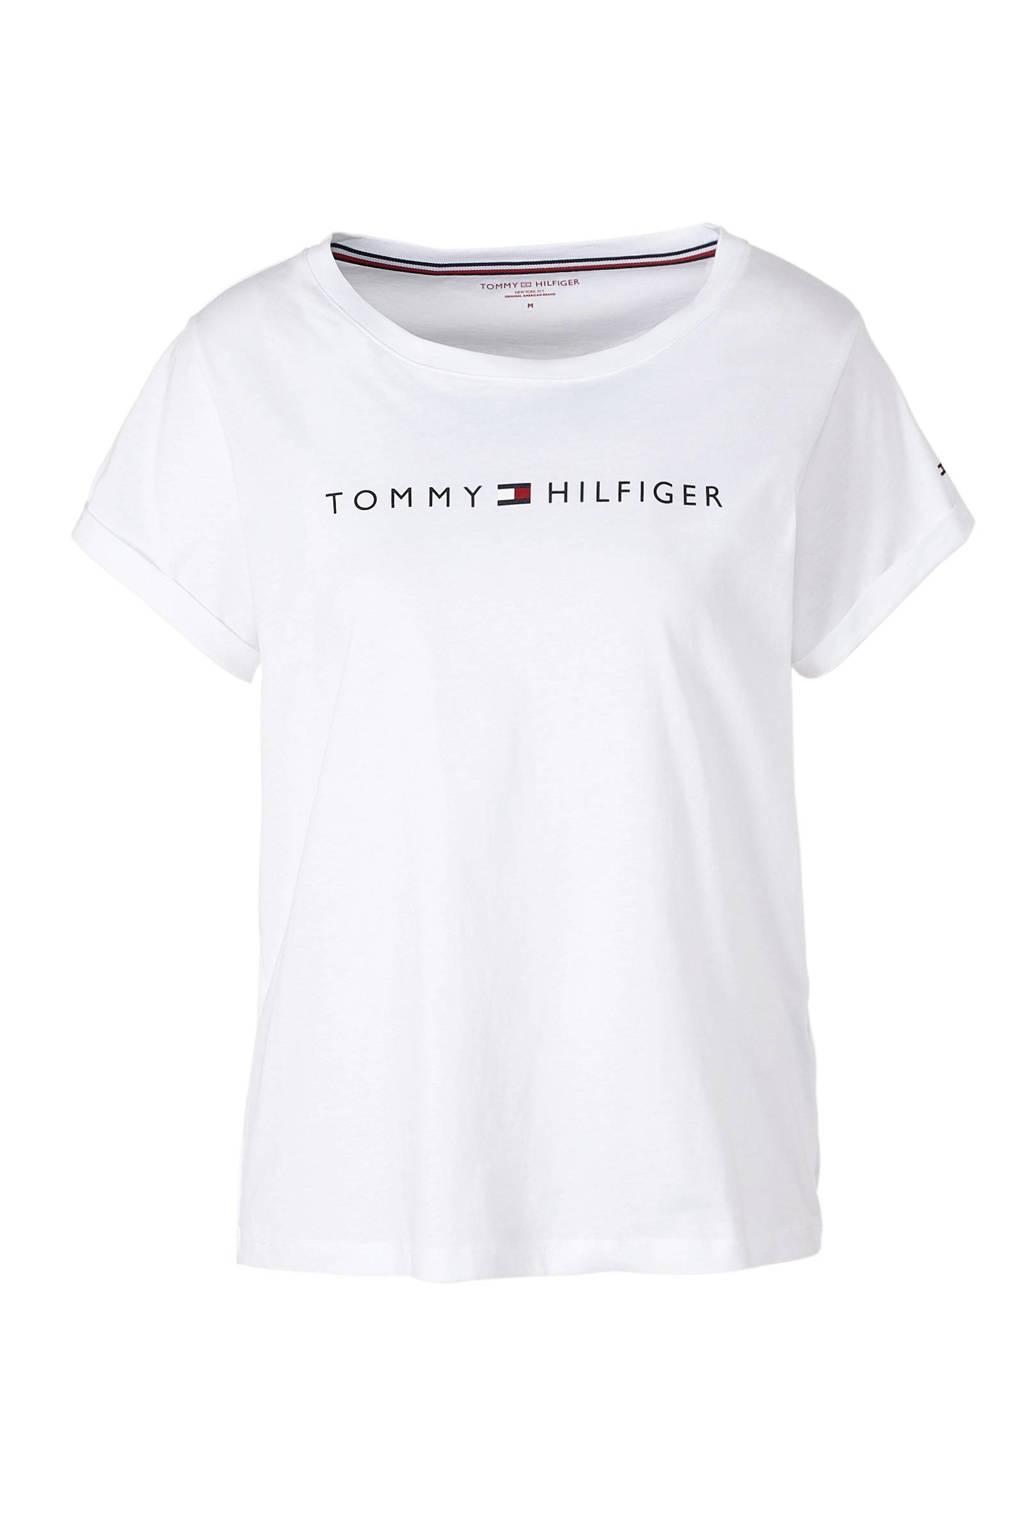 Tommy Hilfiger T-shirt met printopdruk wit, Wit